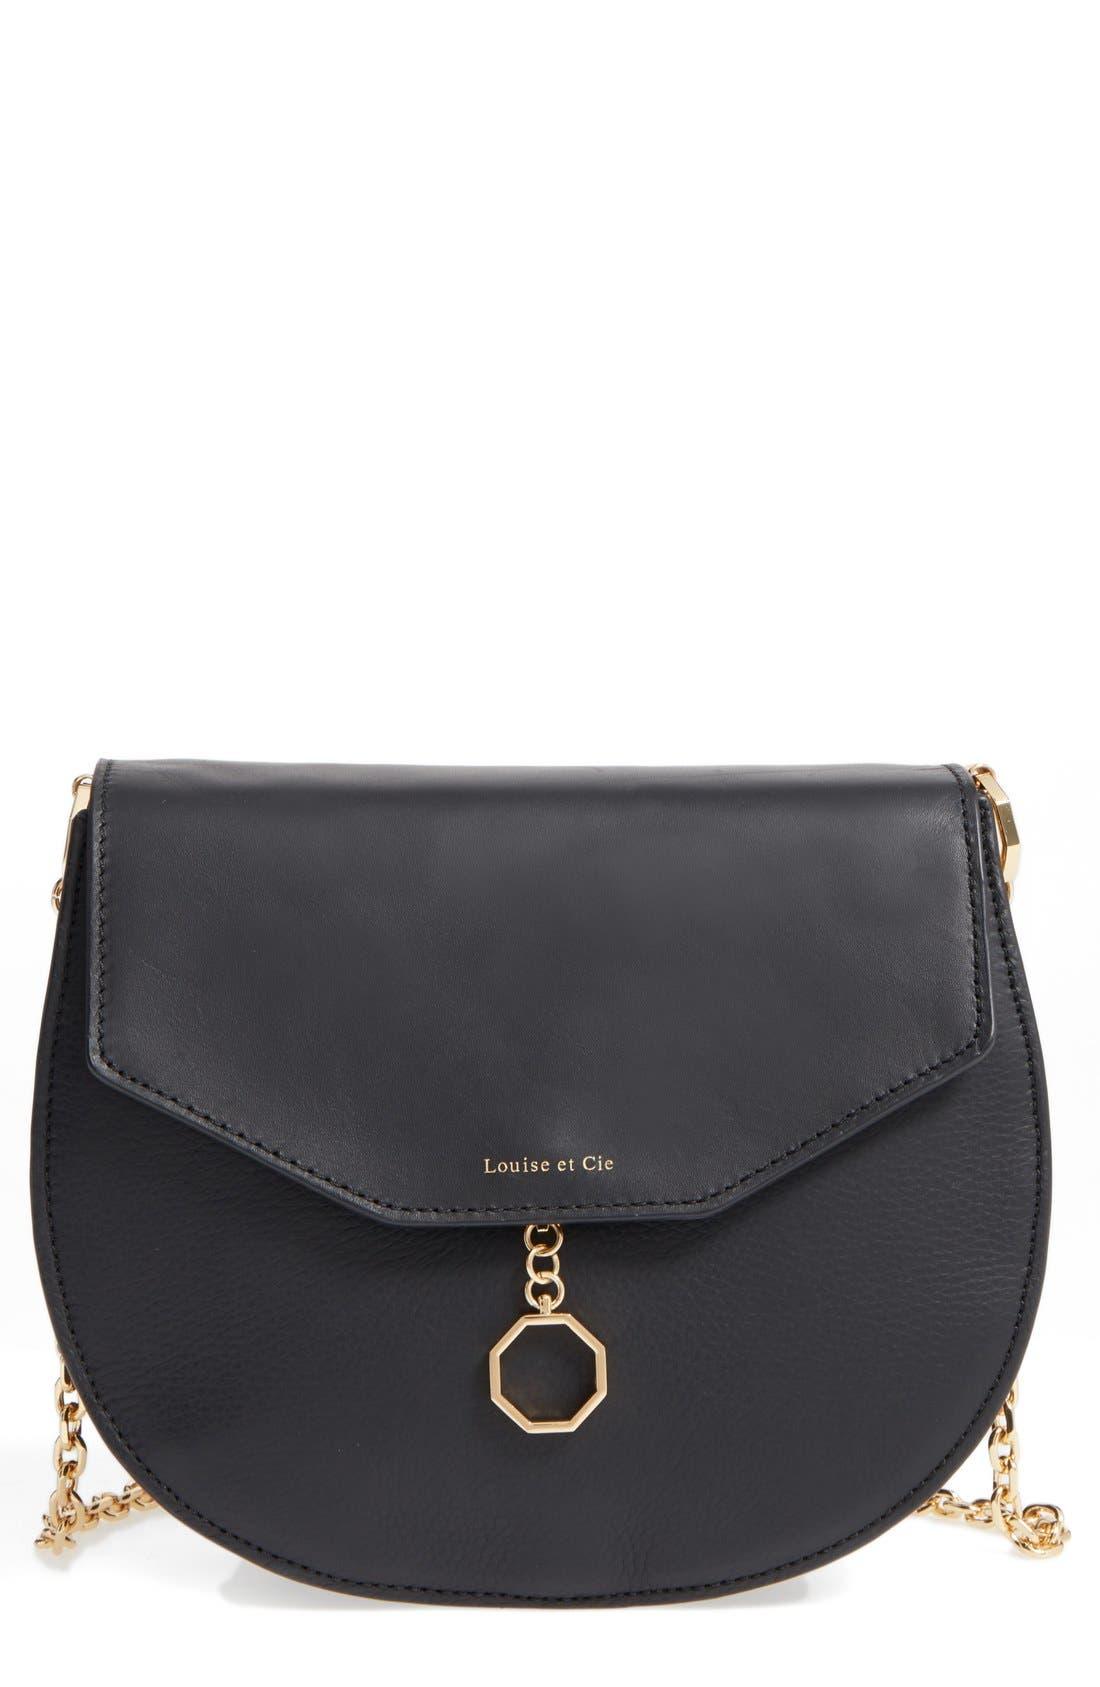 Alternate Image 1 Selected - Louise et Cie Jael Leather Crossbody Bag